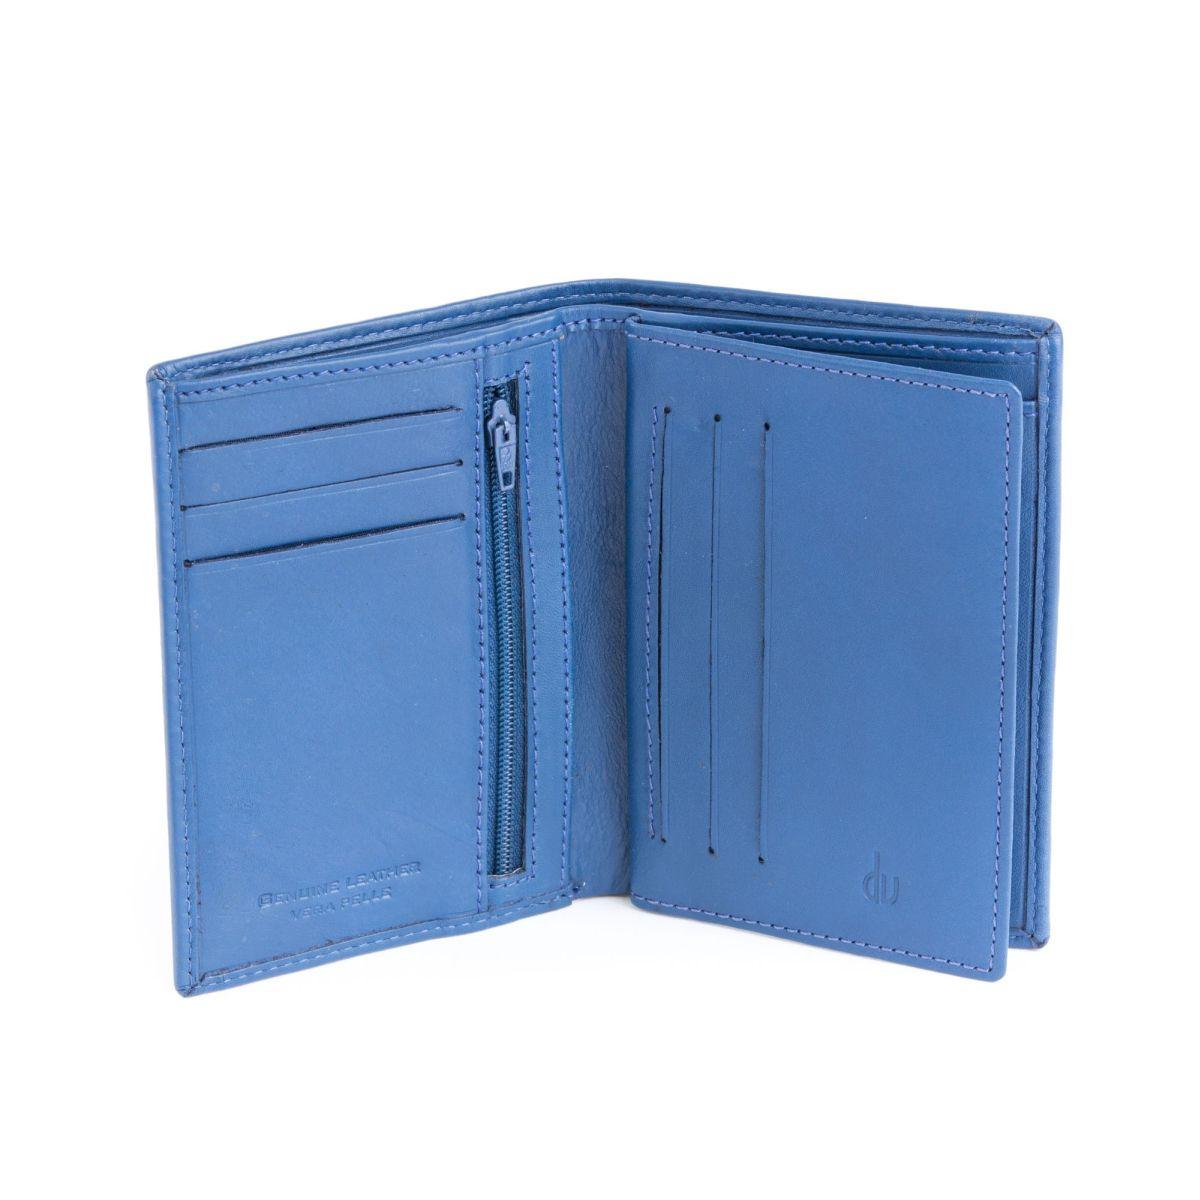 dv ארנק עור איכותי פתיחת ספר - כחול